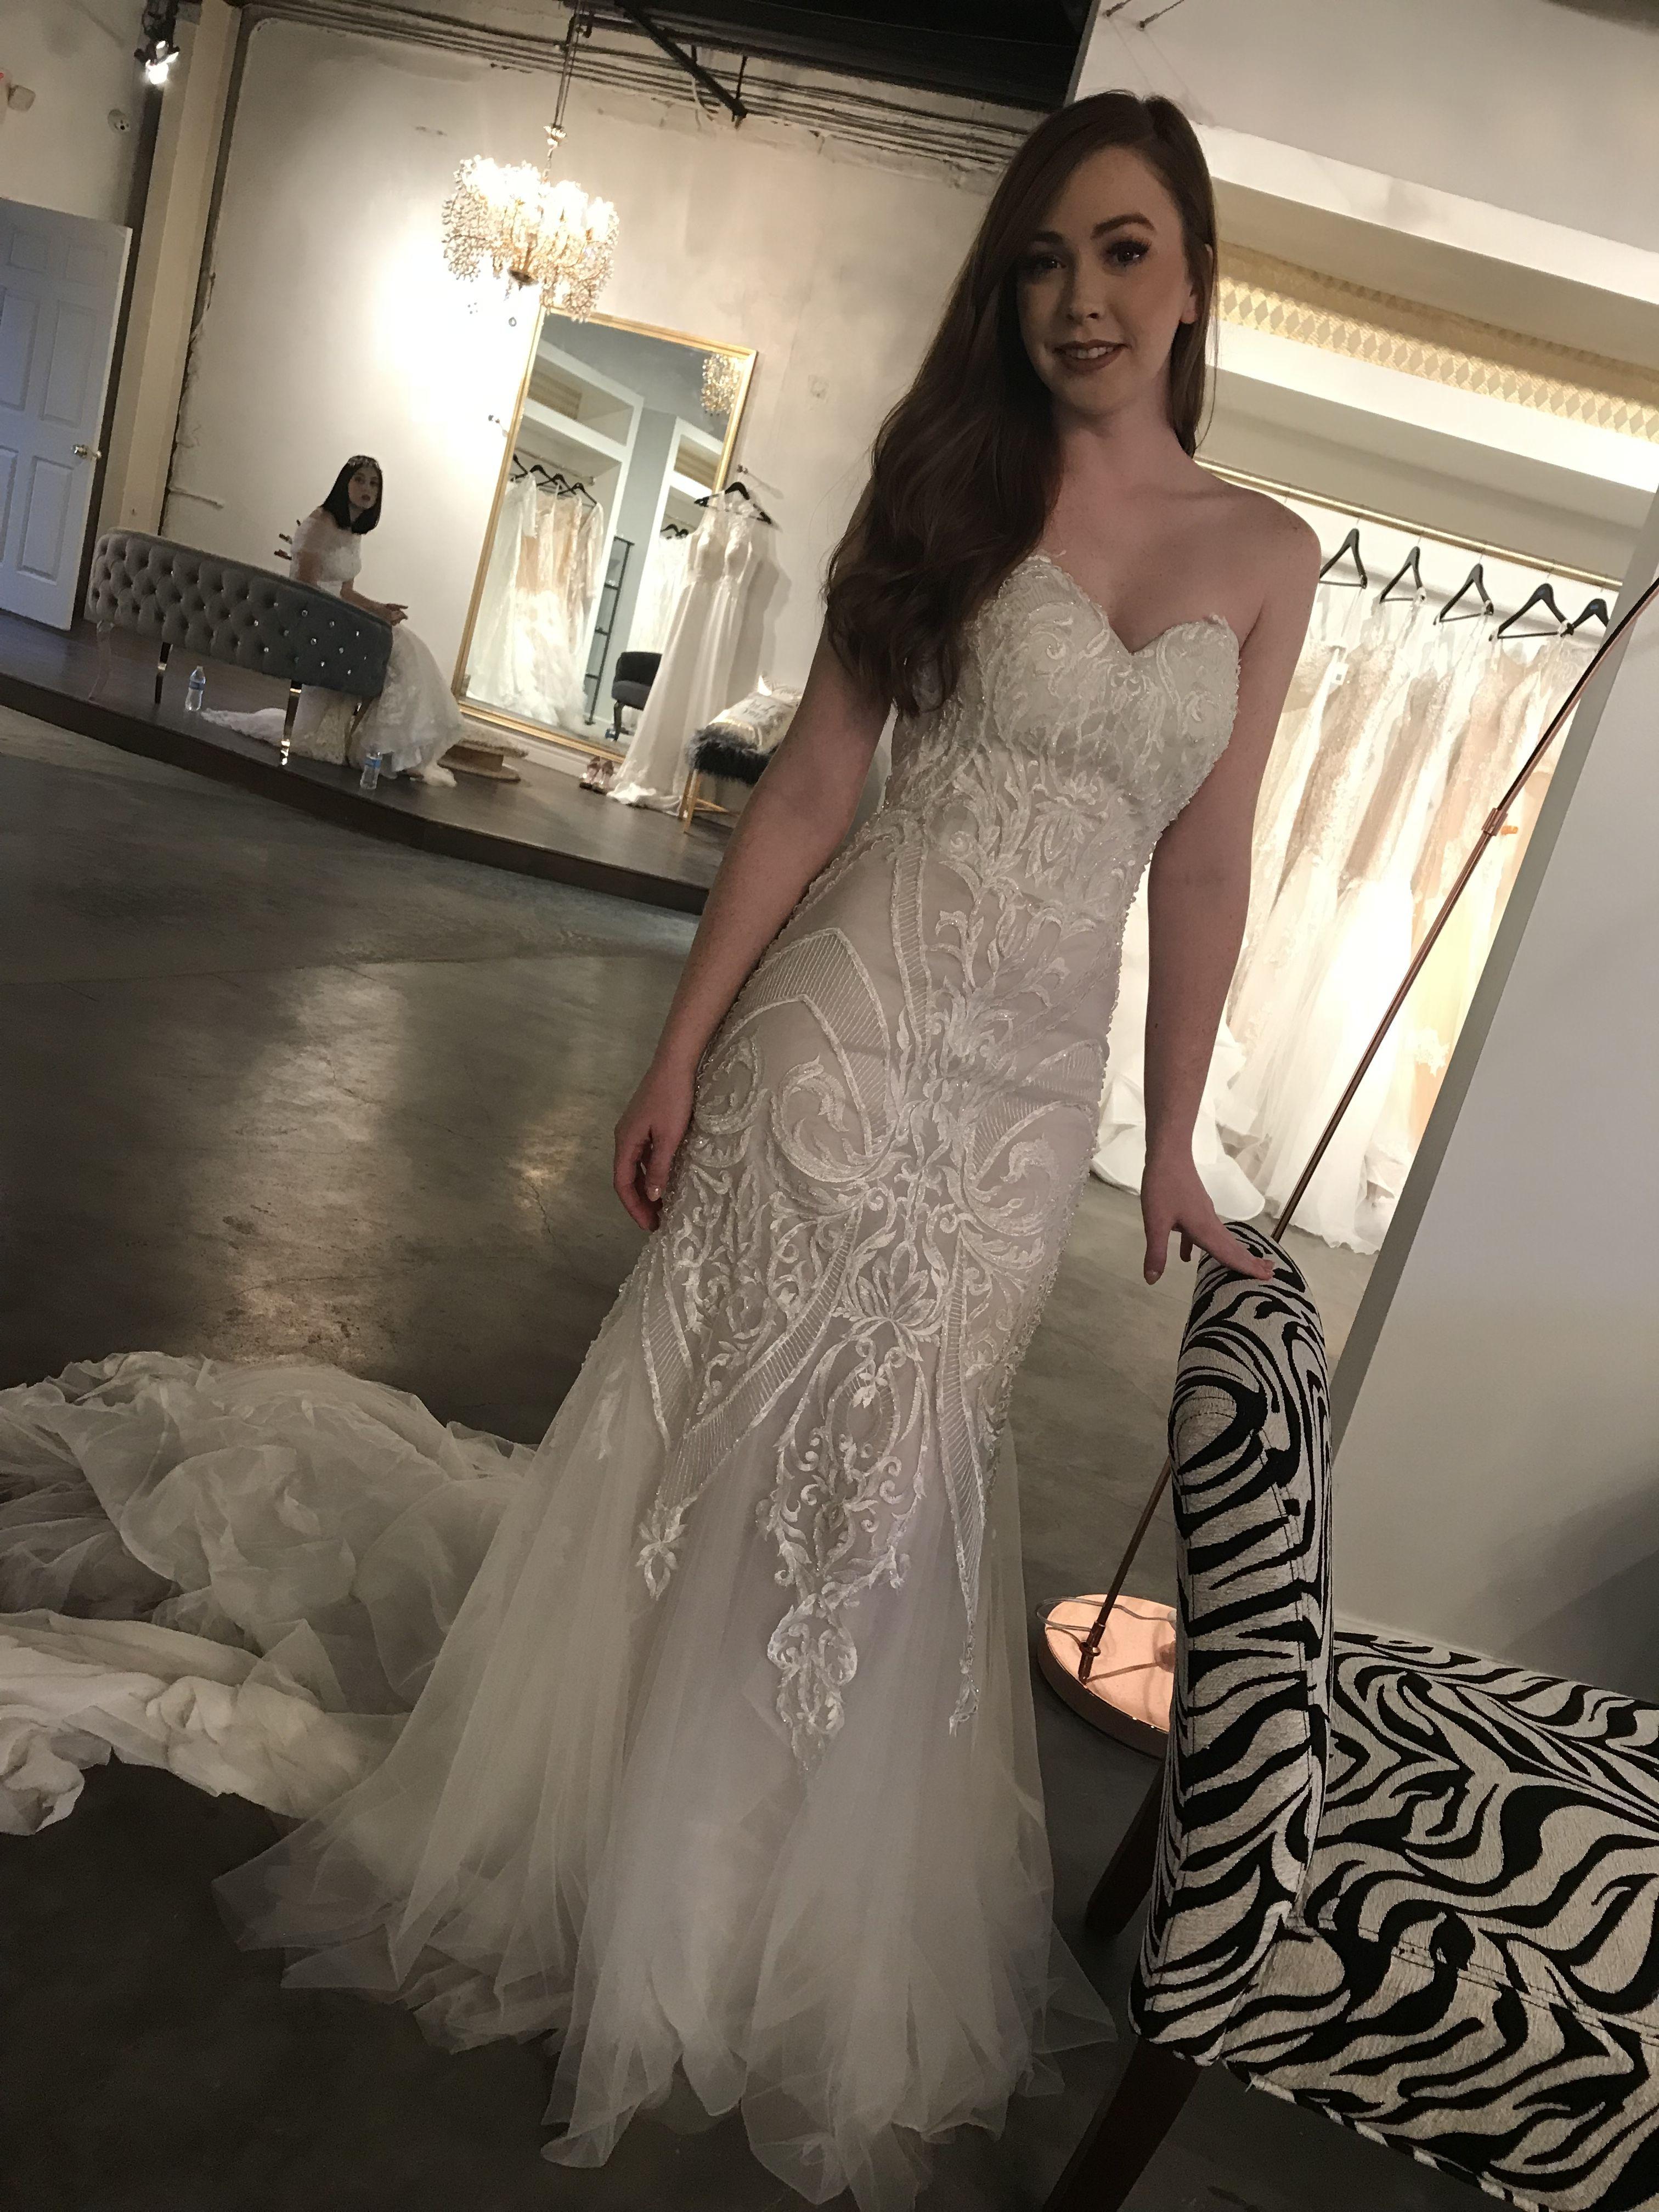 Best Selling Crystal Dress Soft Mermaid Style Wedding Dress